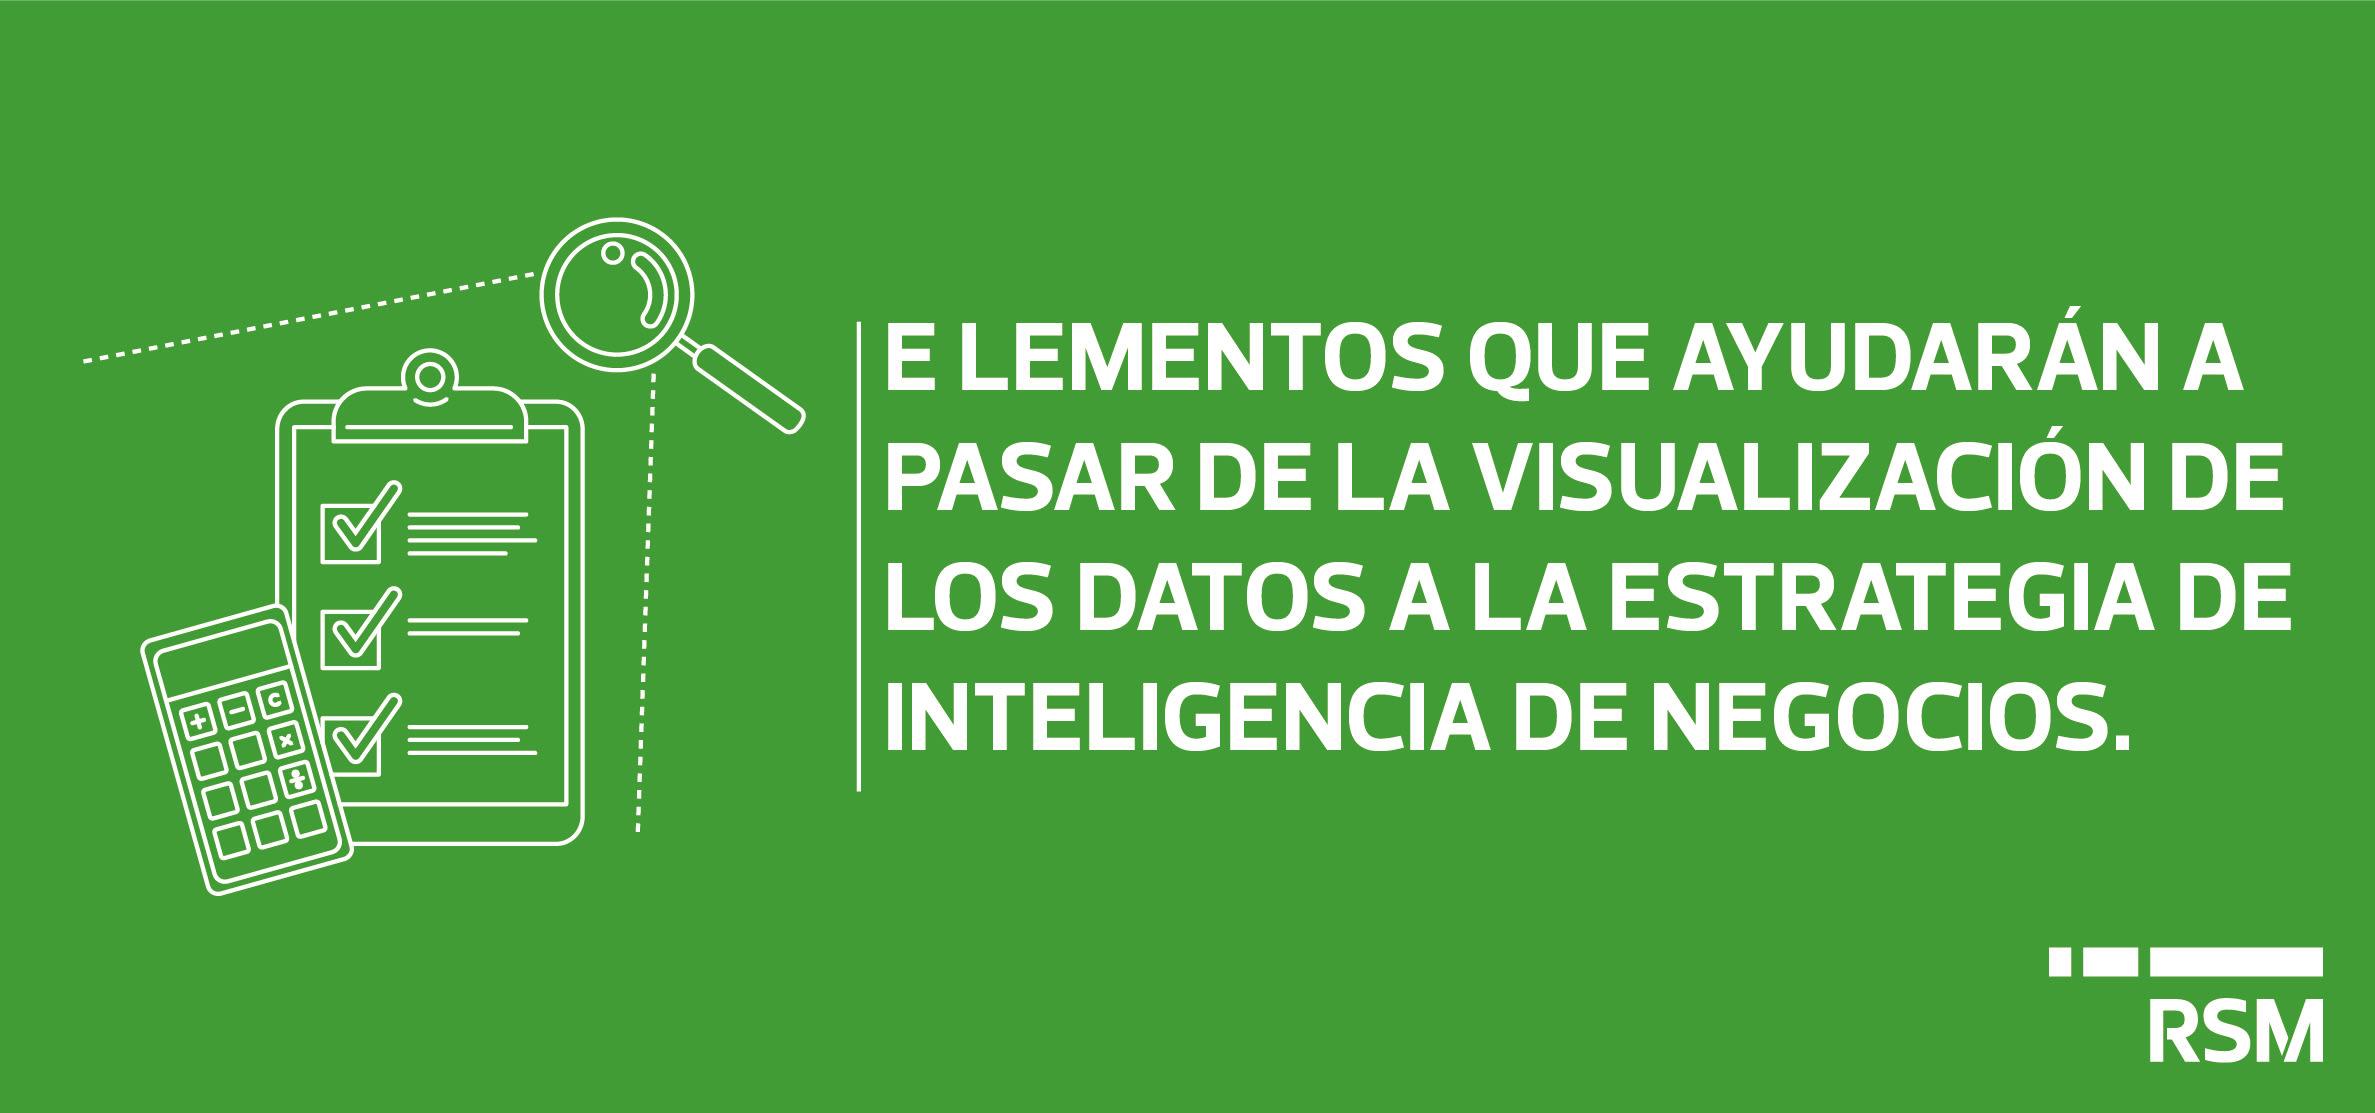 public://media/Lineas_negocio/consultoria/Insights/IMG/miniaturas_pagina_web_blogs-11.jpg